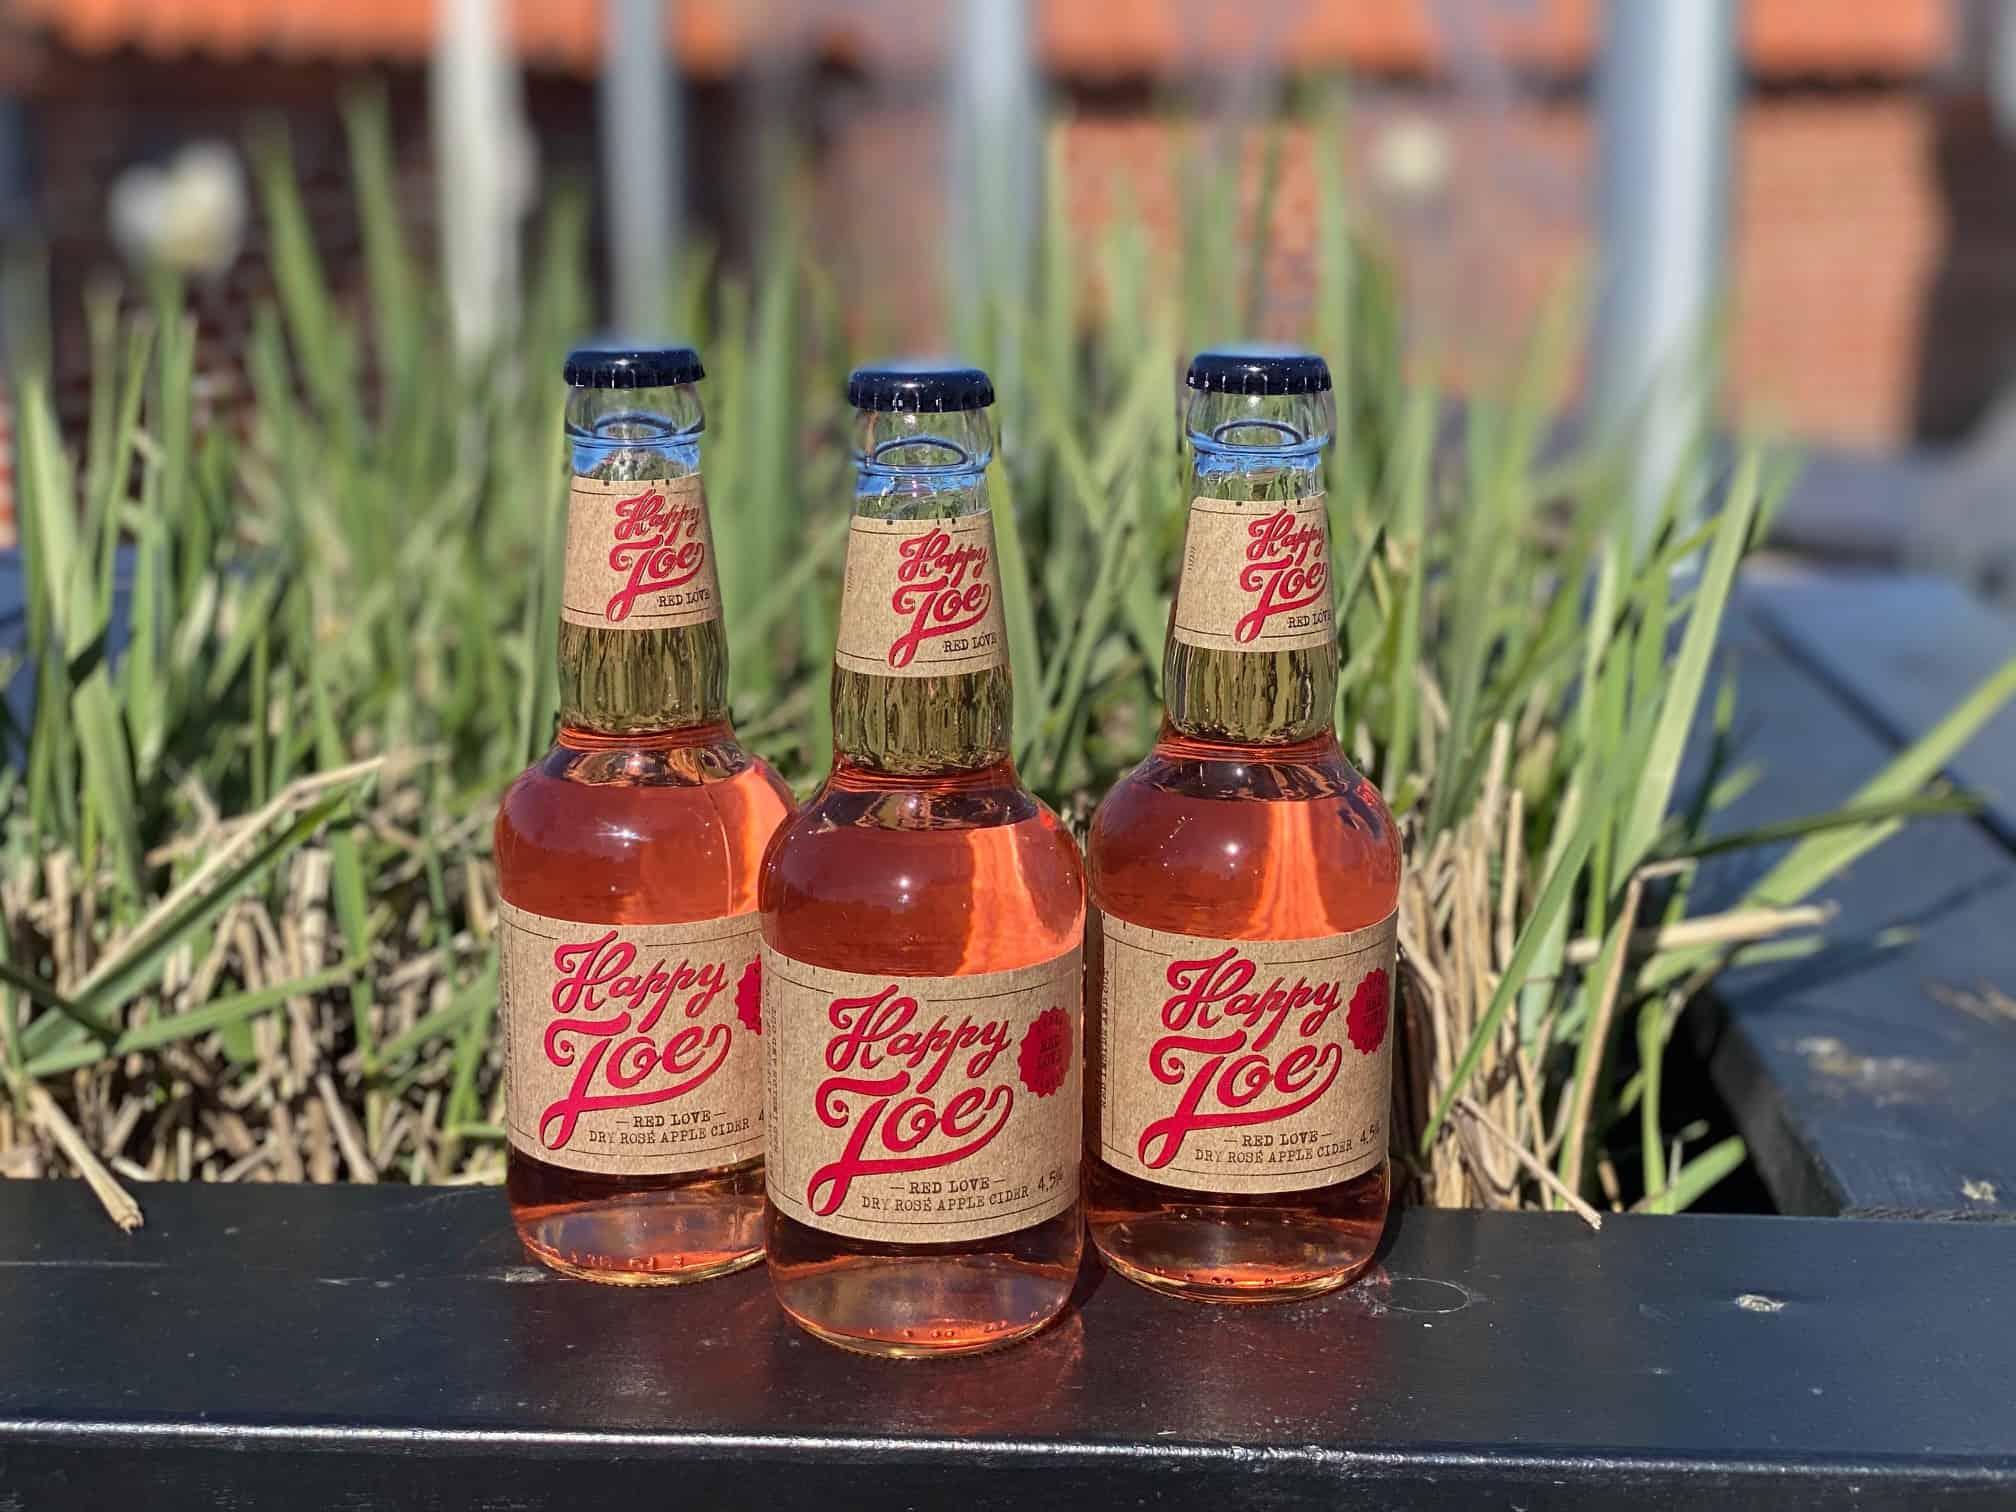 Happy Joe Rose' Apple Cider